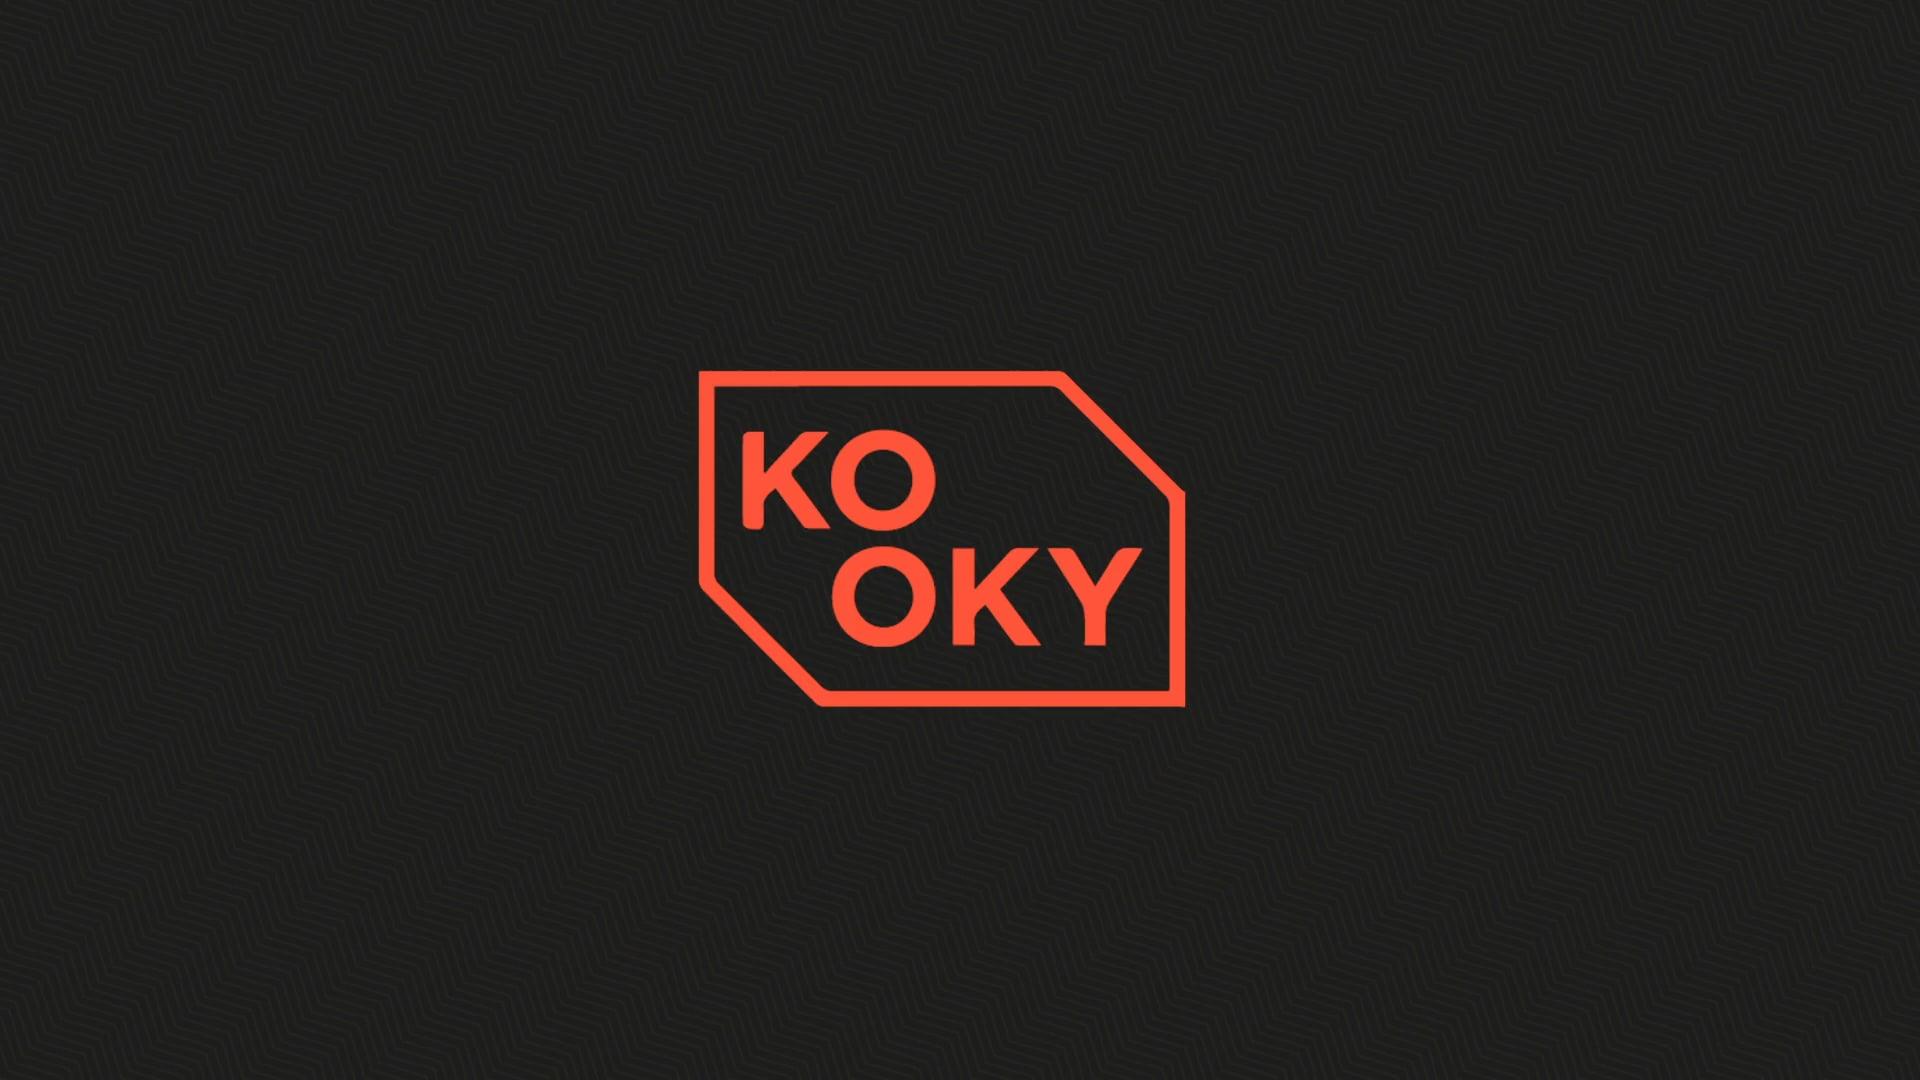 Kooky for Chocolate Ltd